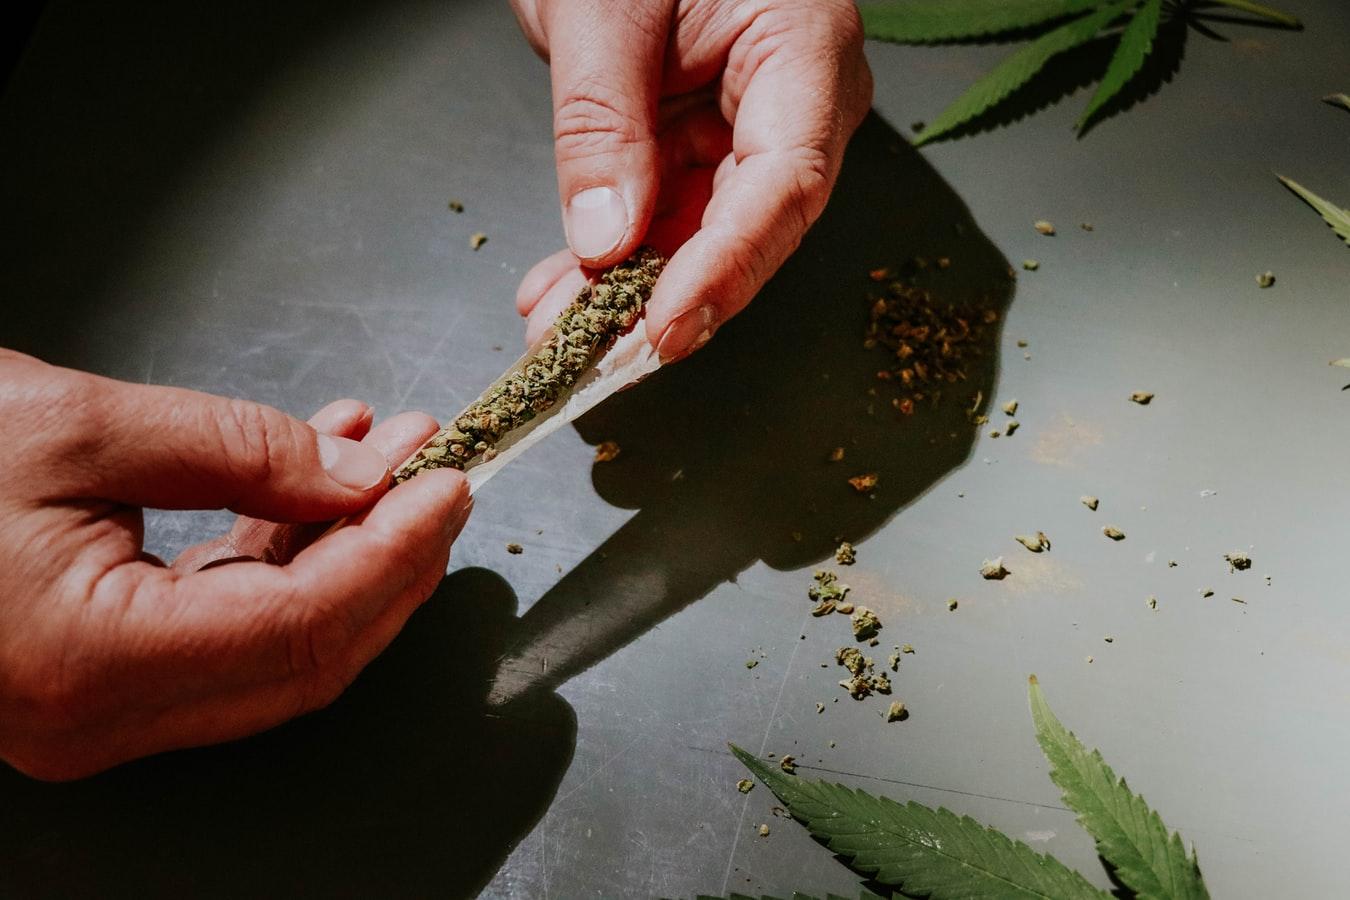 Activists to Give Marijuana to Vaccine